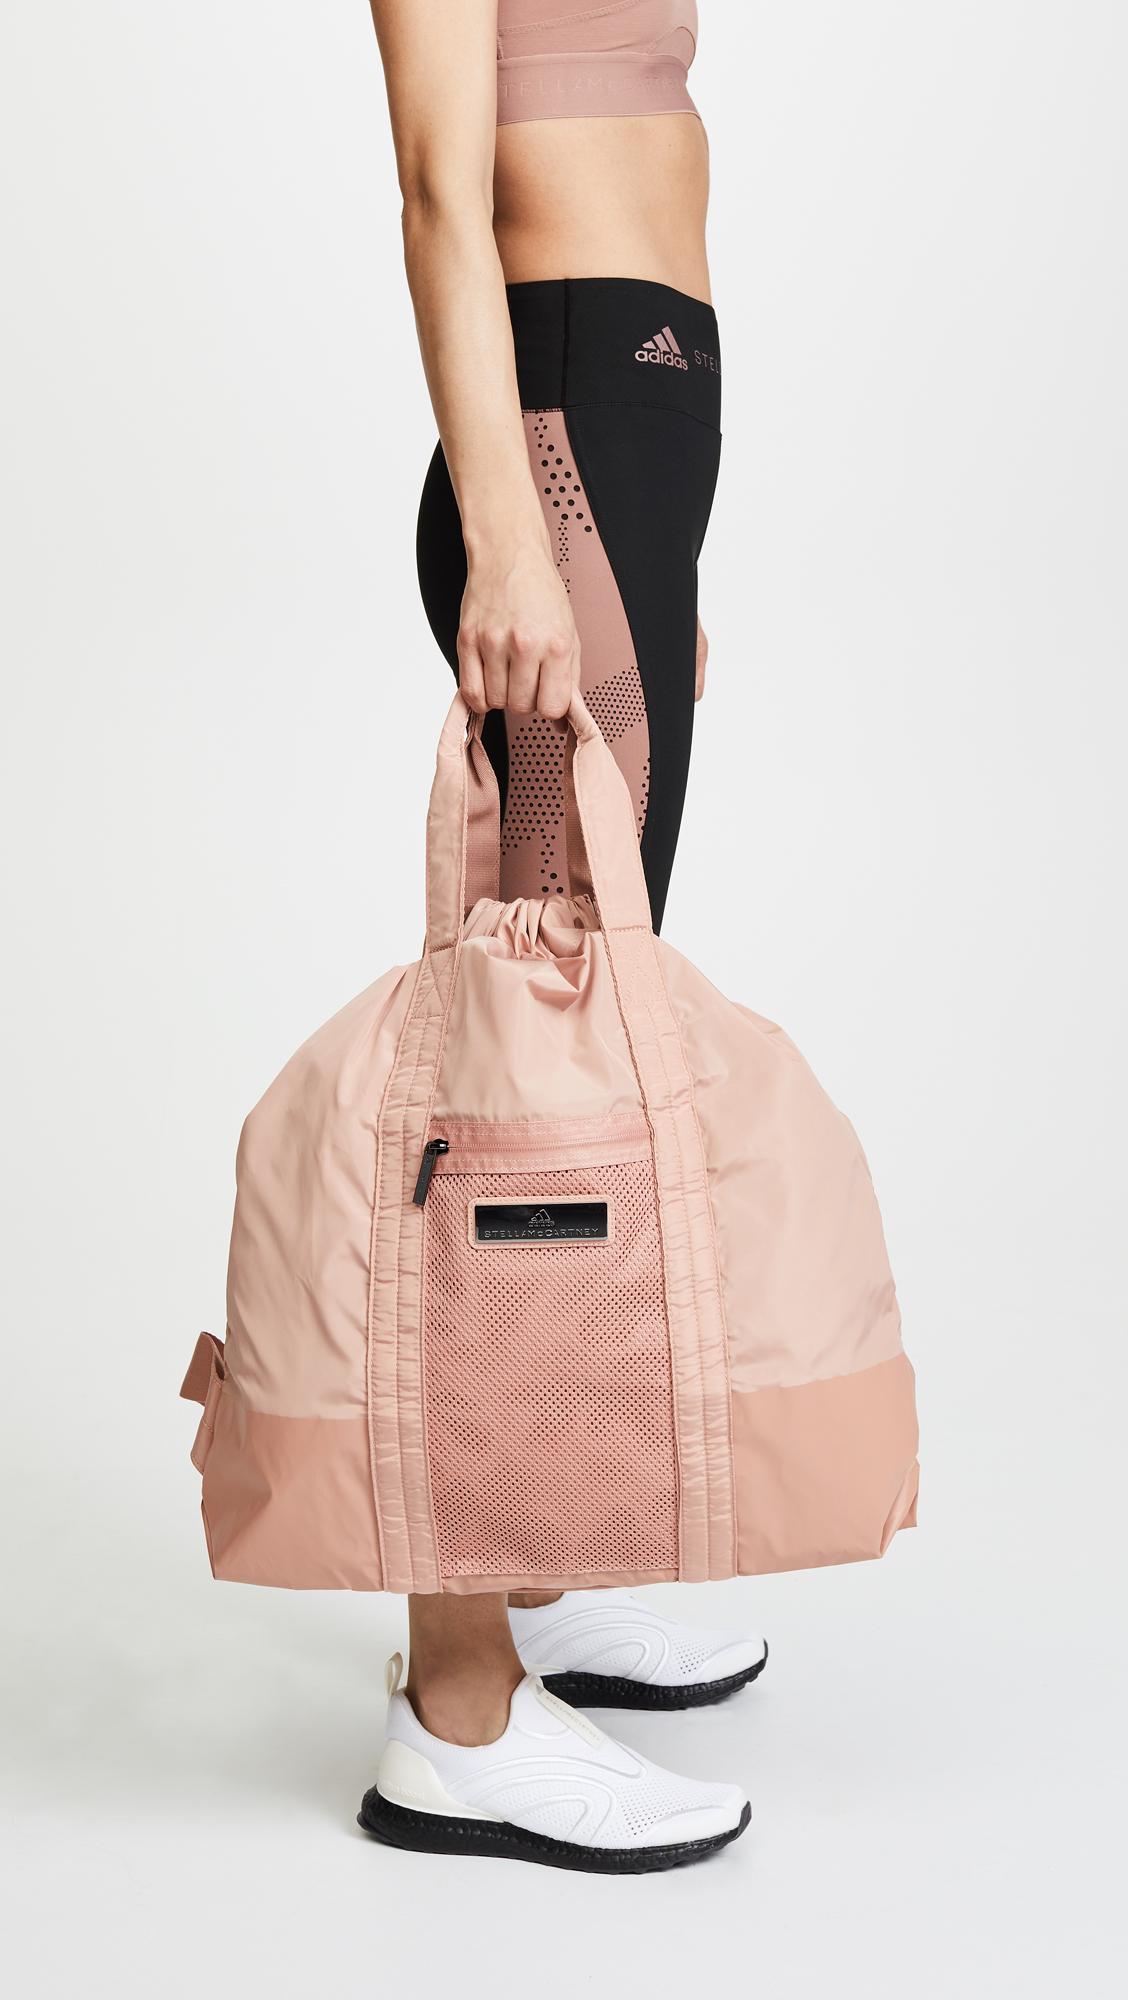 new style f8e14 e92ce adidas by Stella McCartney Gym Sack Backpack   SHOPBOP